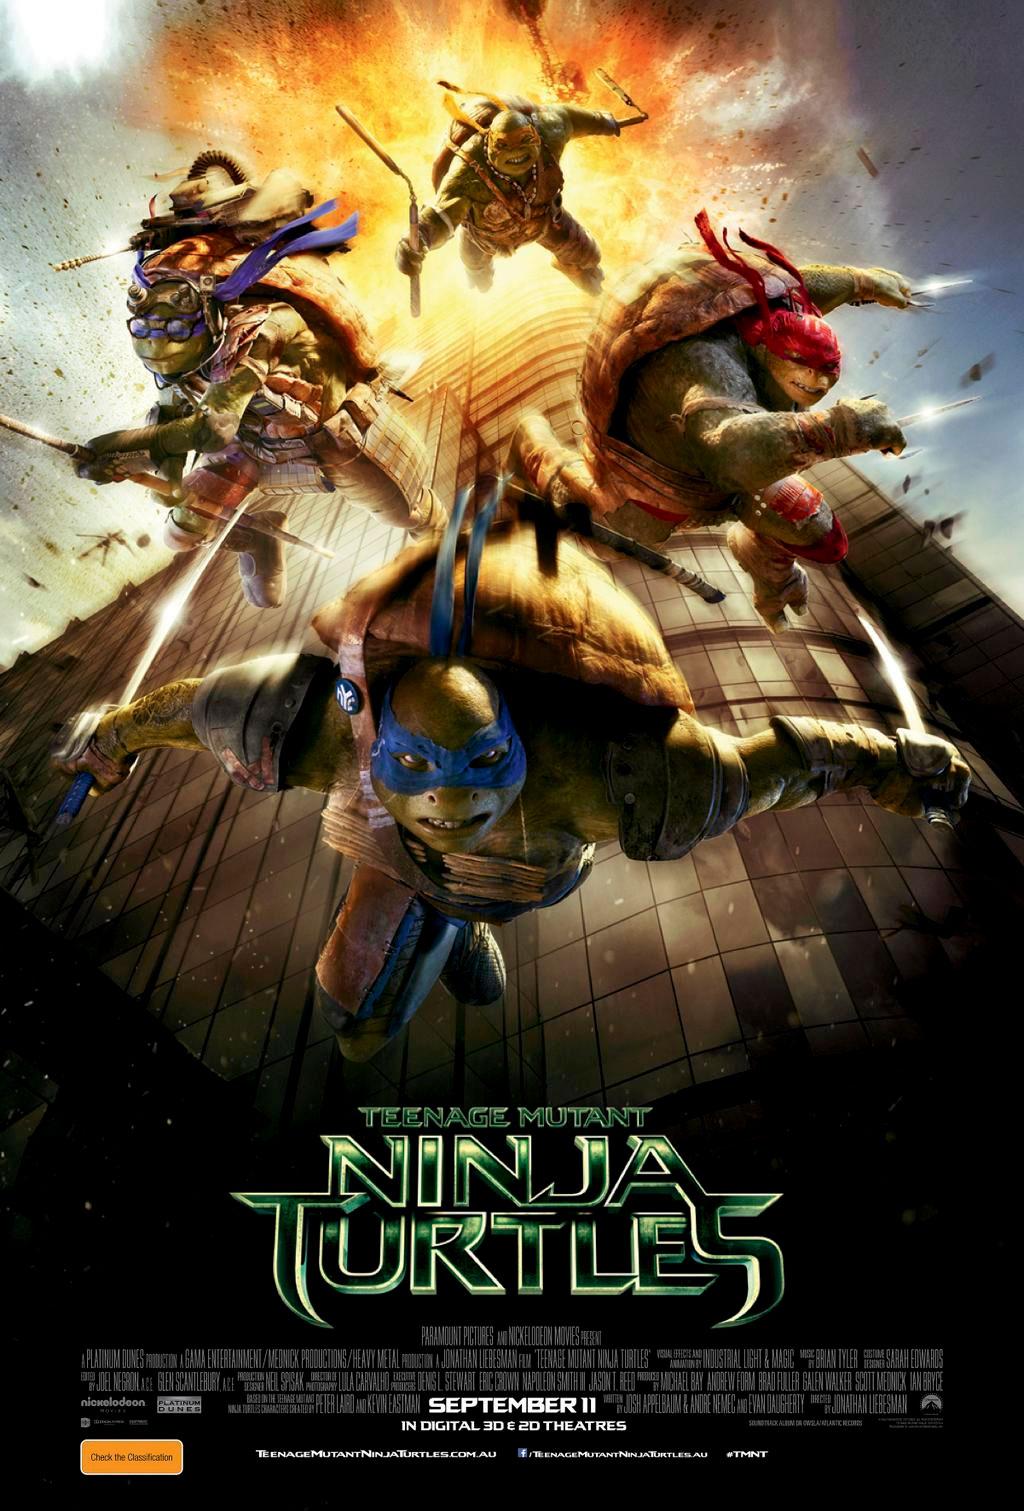 wojownicze żółwie ninja film recenzja plakat megan fox